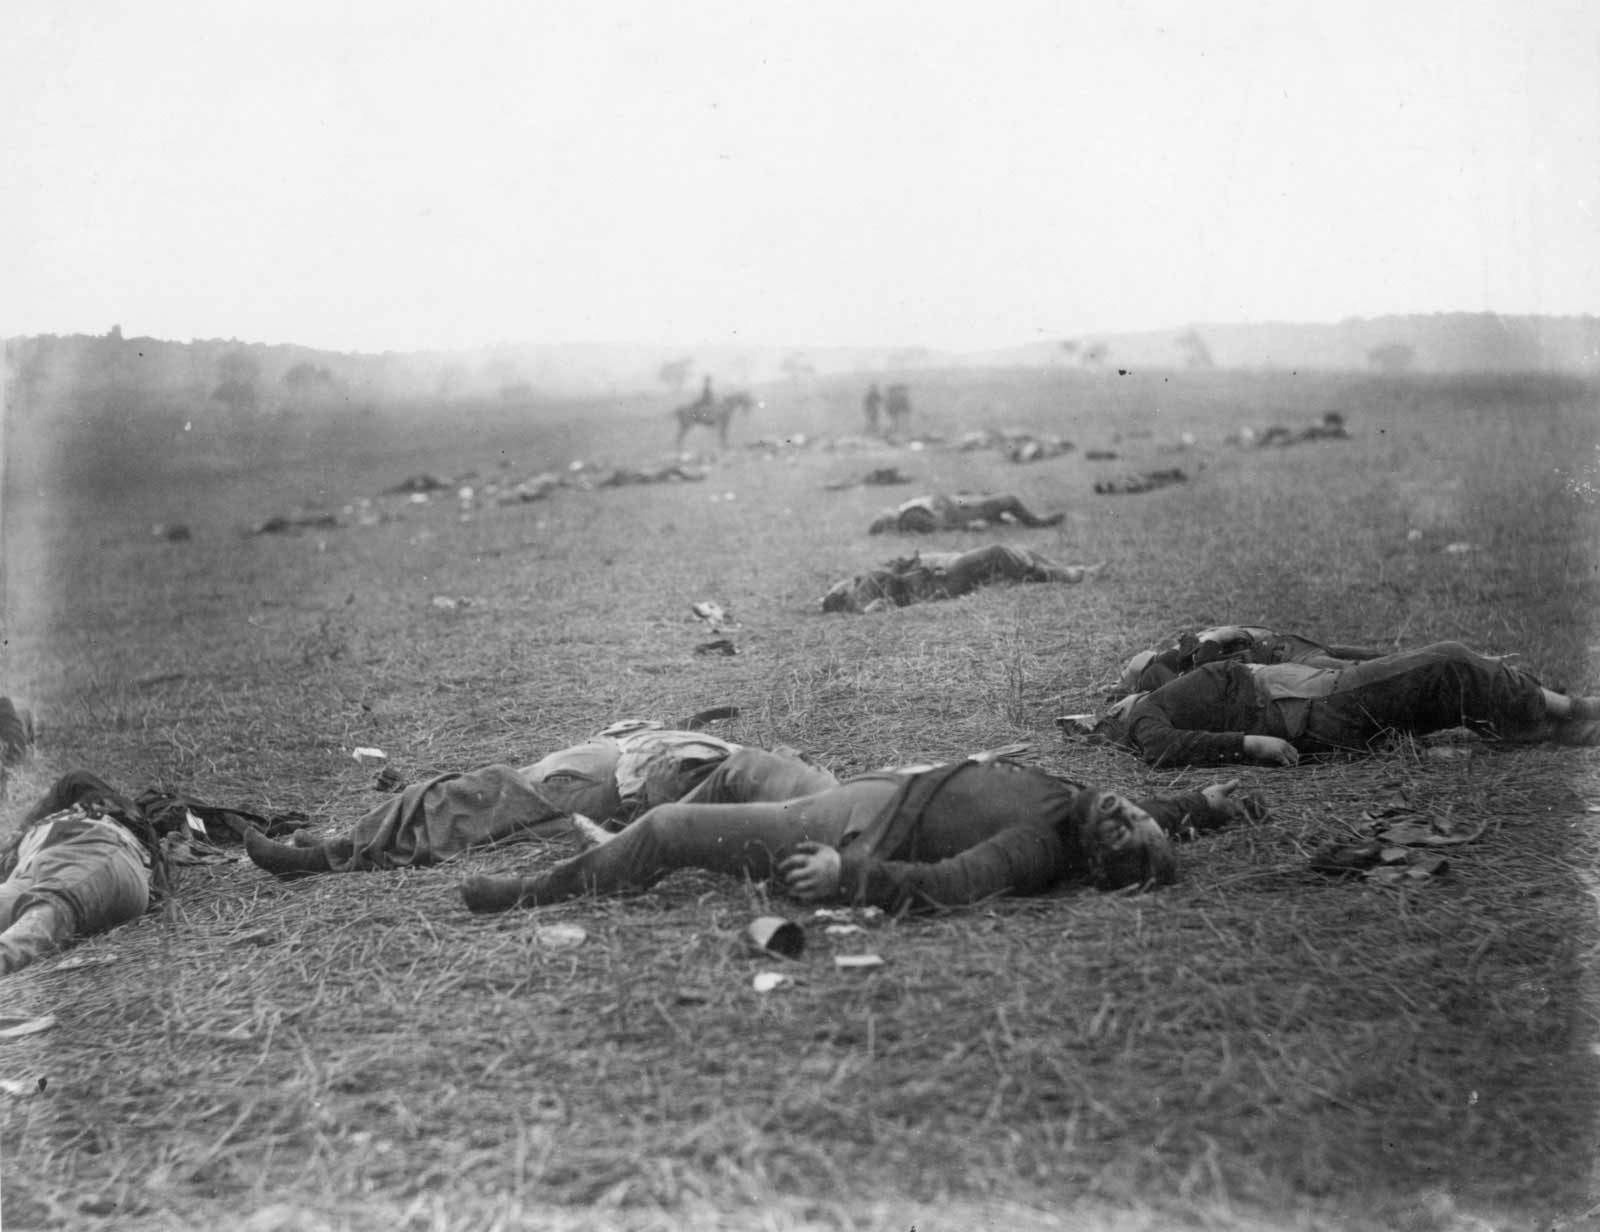 gettysburg-photograph-by-timothy-osullivan-july-1863